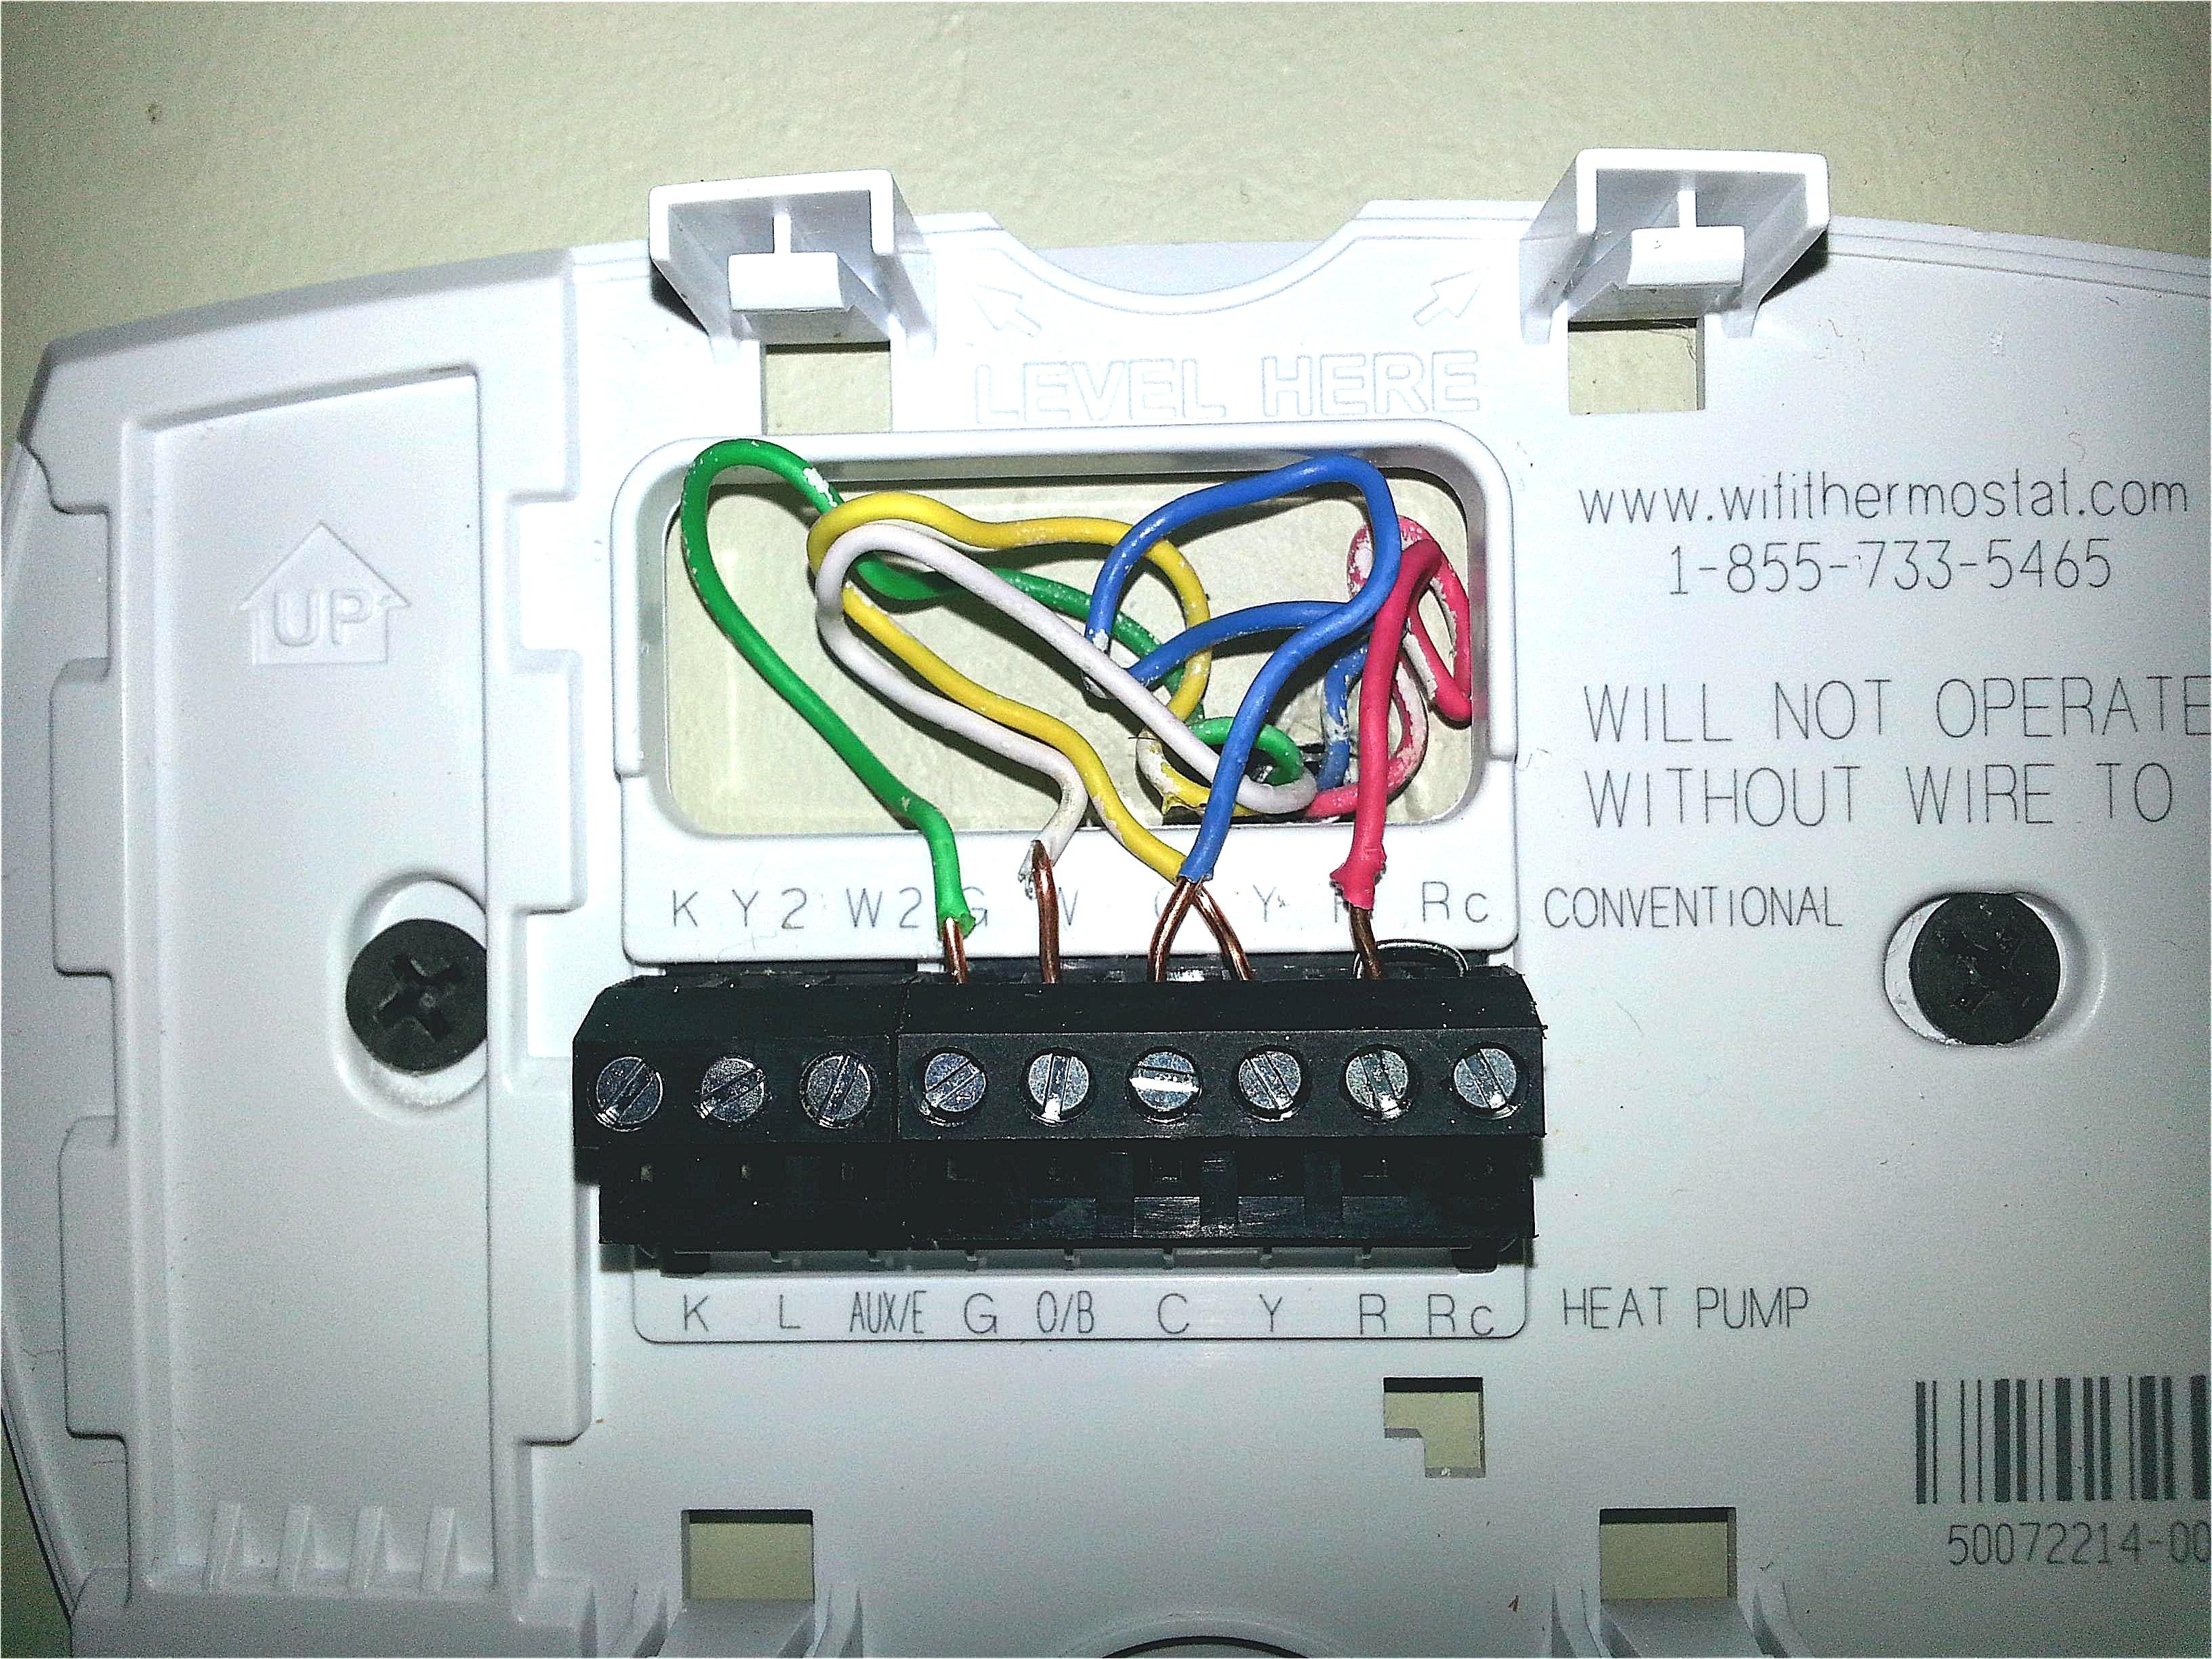 Honeywell Lyric T5 thermostat Wiring Diagram Honeywell Programmable thermostat Likewise Honeywell thermostat